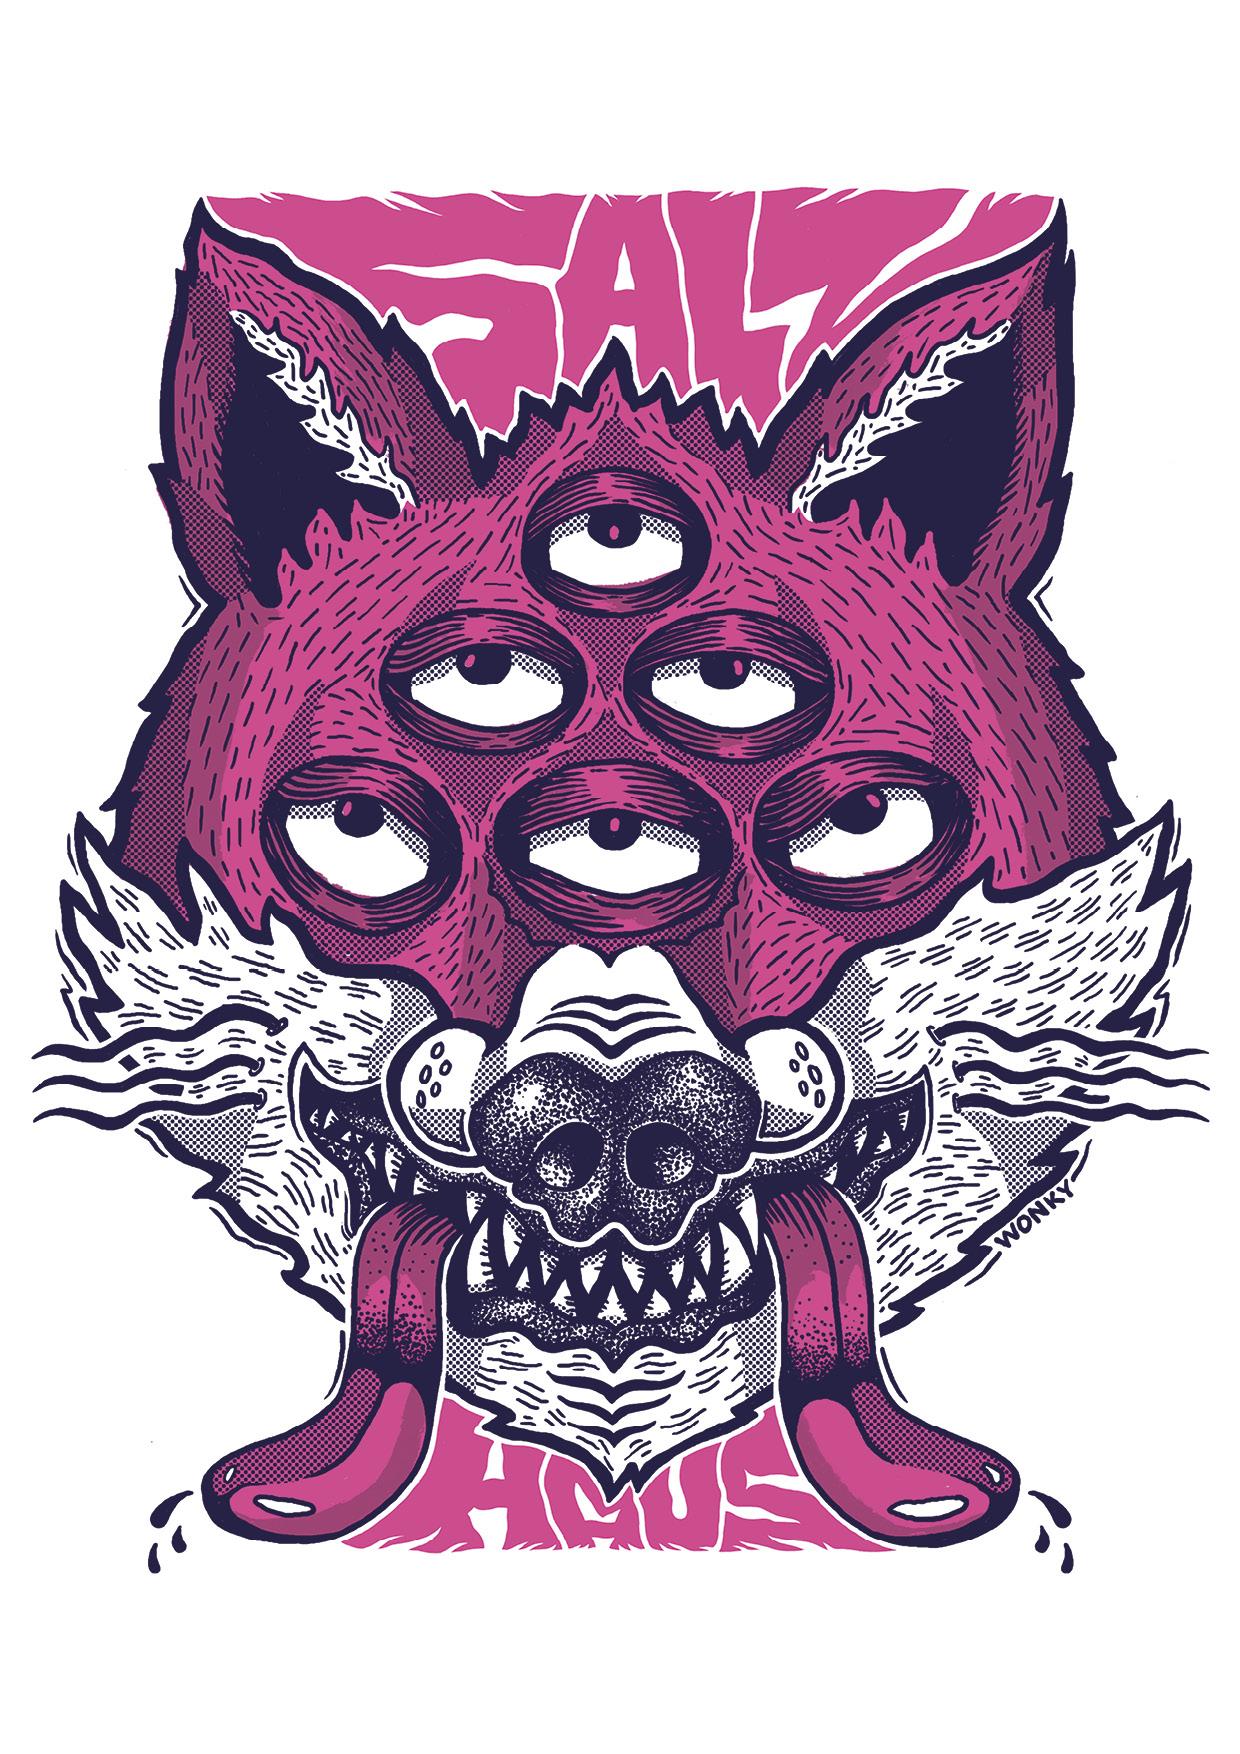 SALZHAUS FOX / SOLD OUT